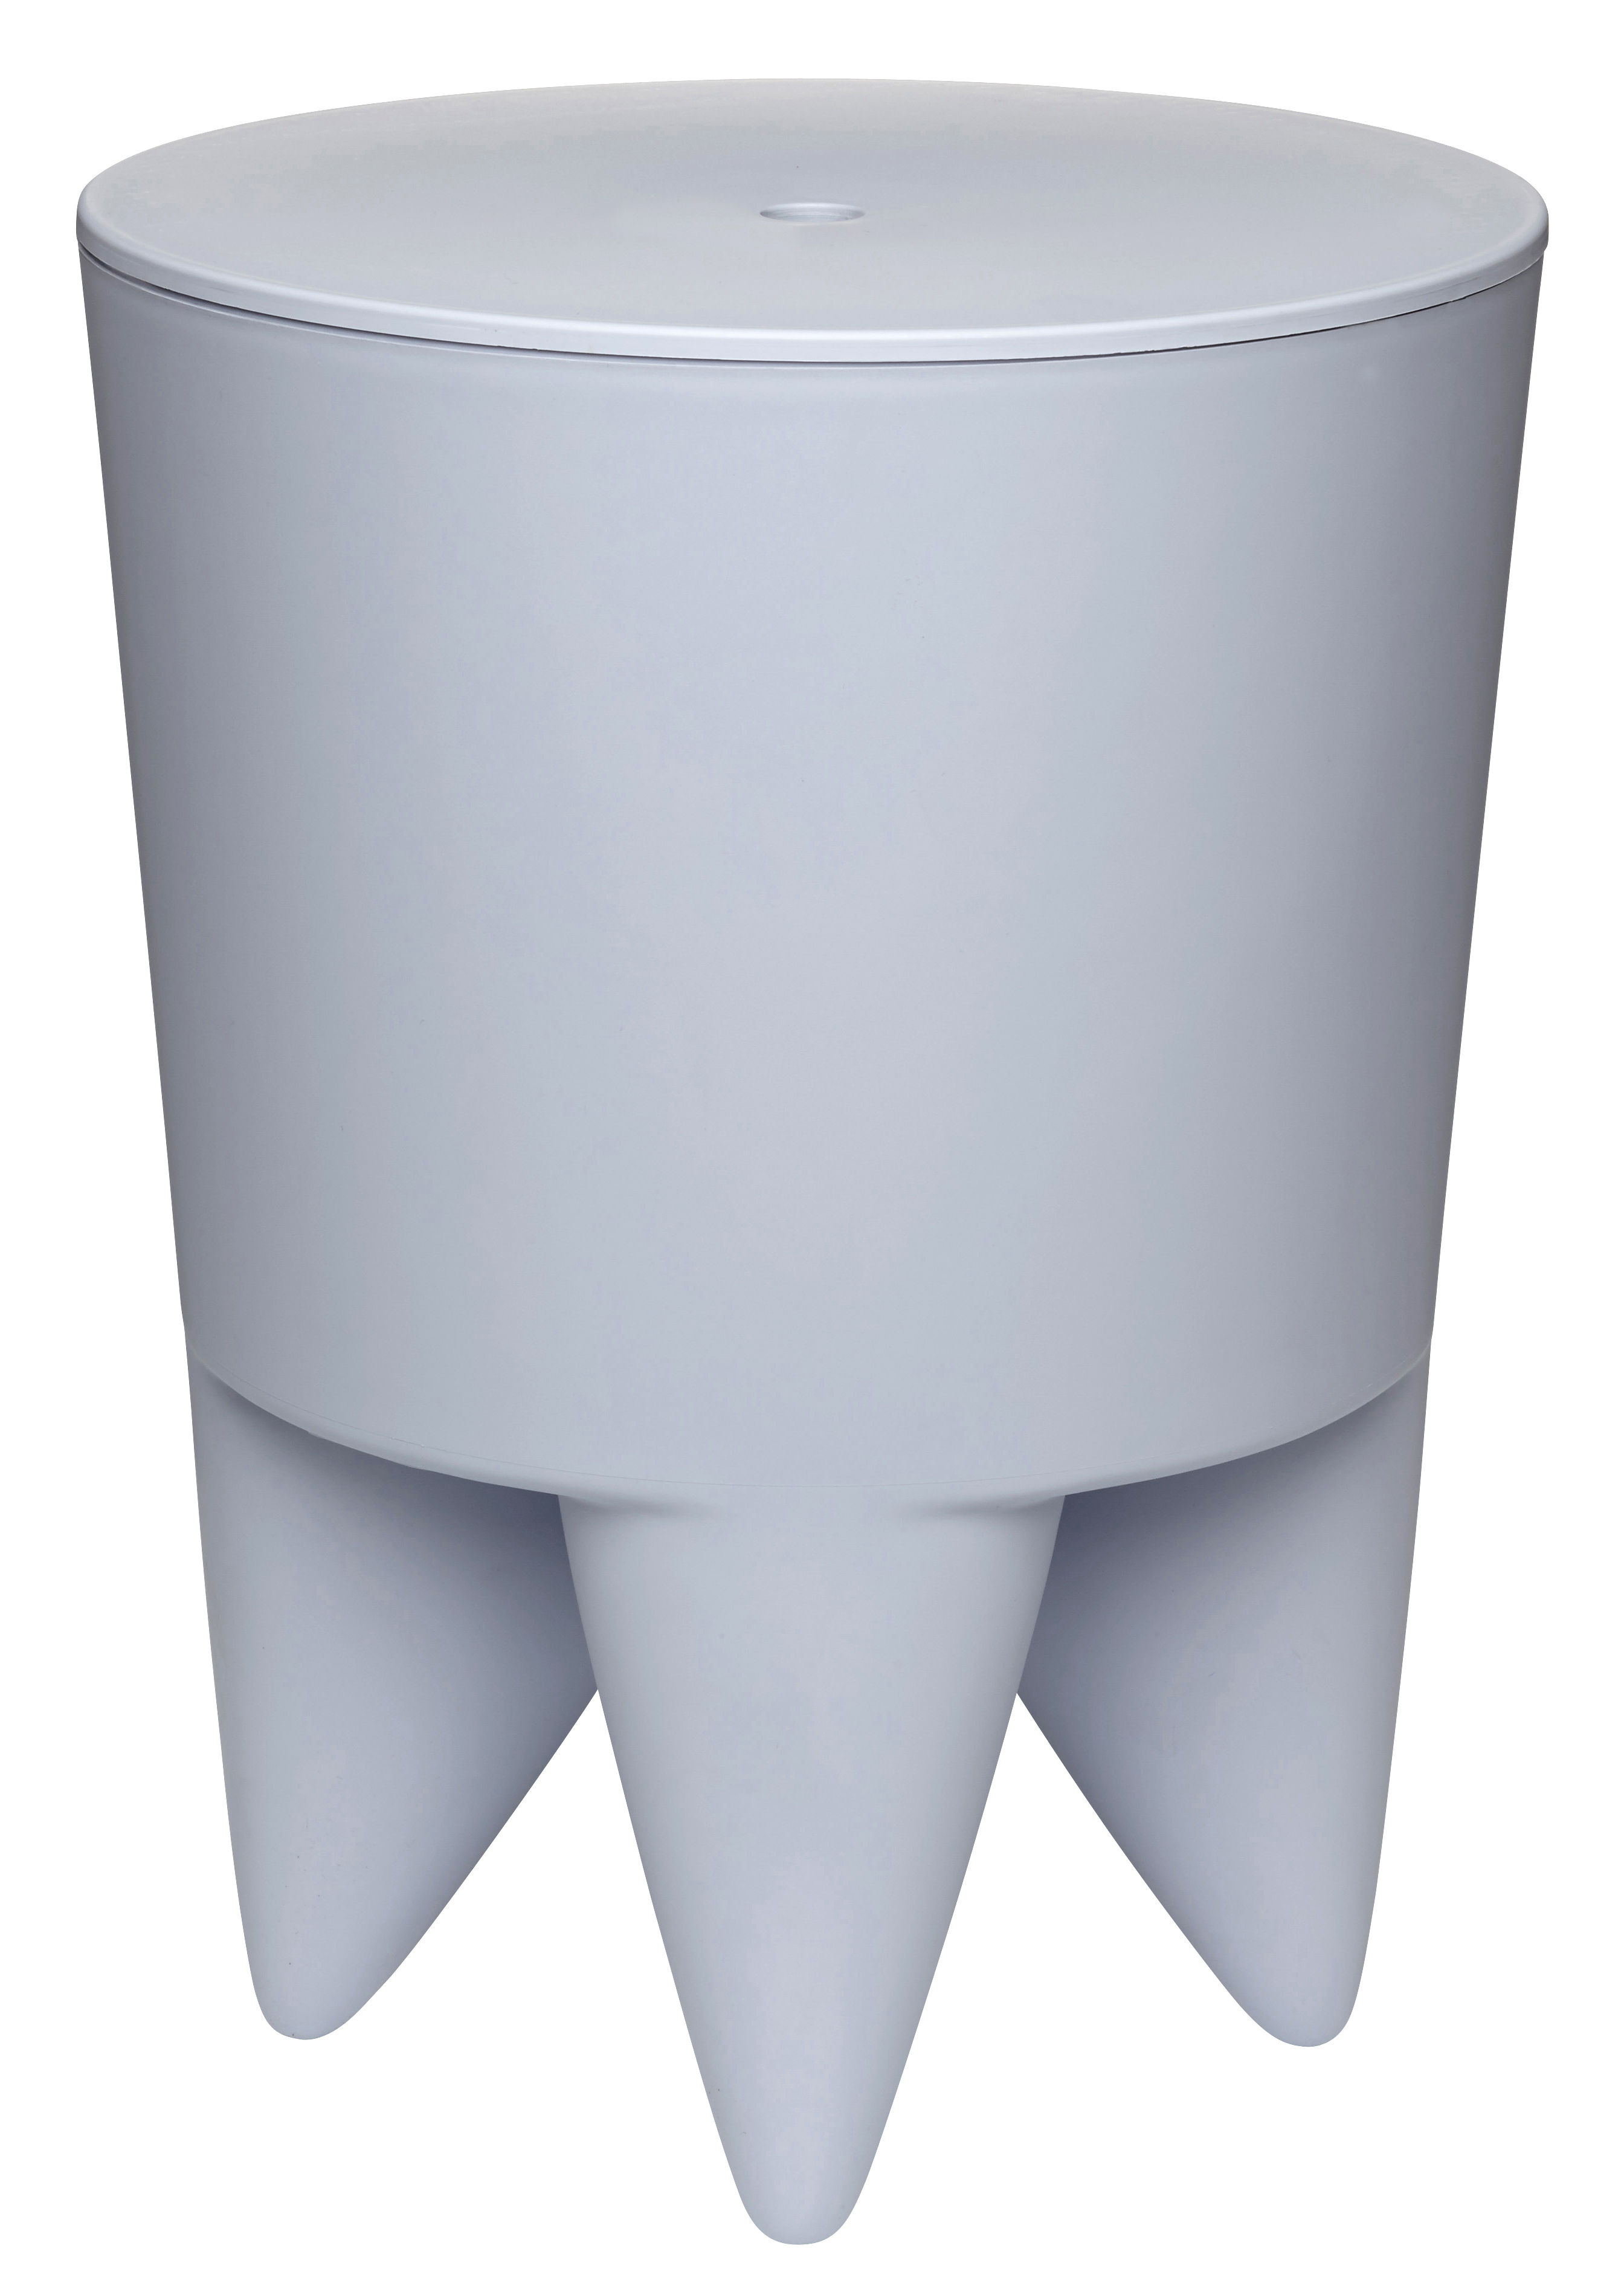 Furniture - Stools - New Bubu 1er Stool - / Box - Plastic by XO - Pale Blue - Polypropylene